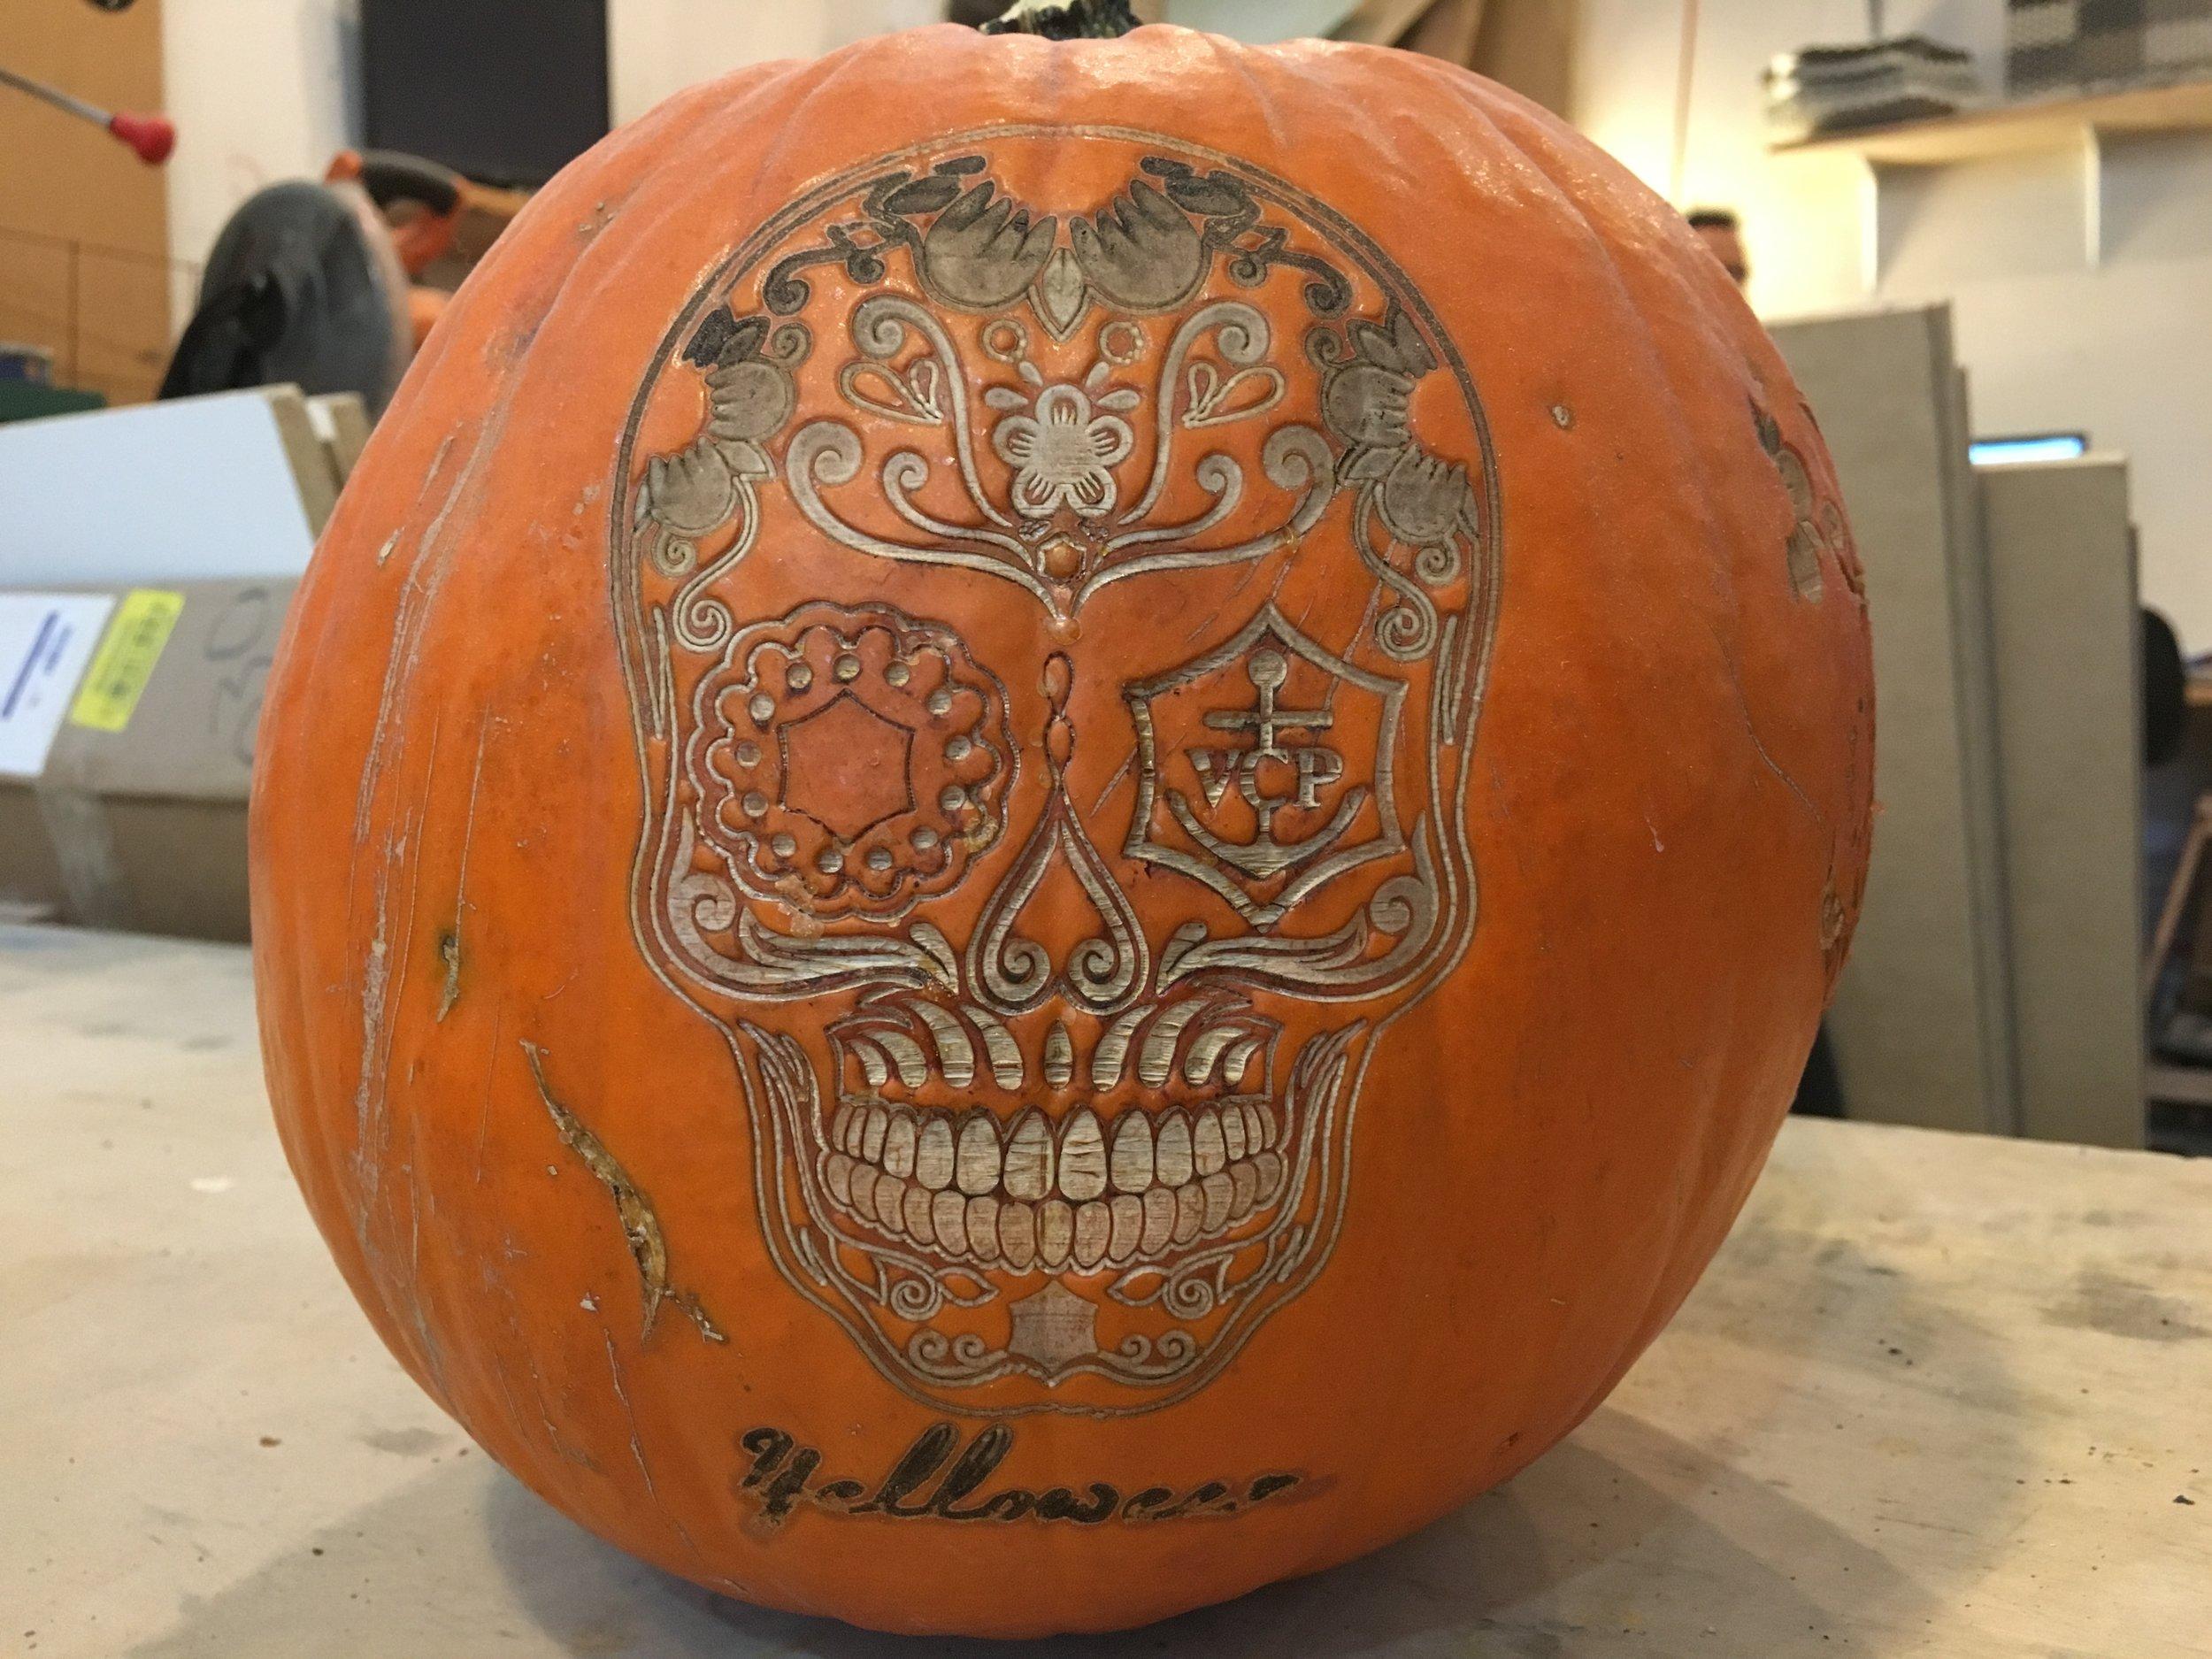 Raster Etched Pumpkin